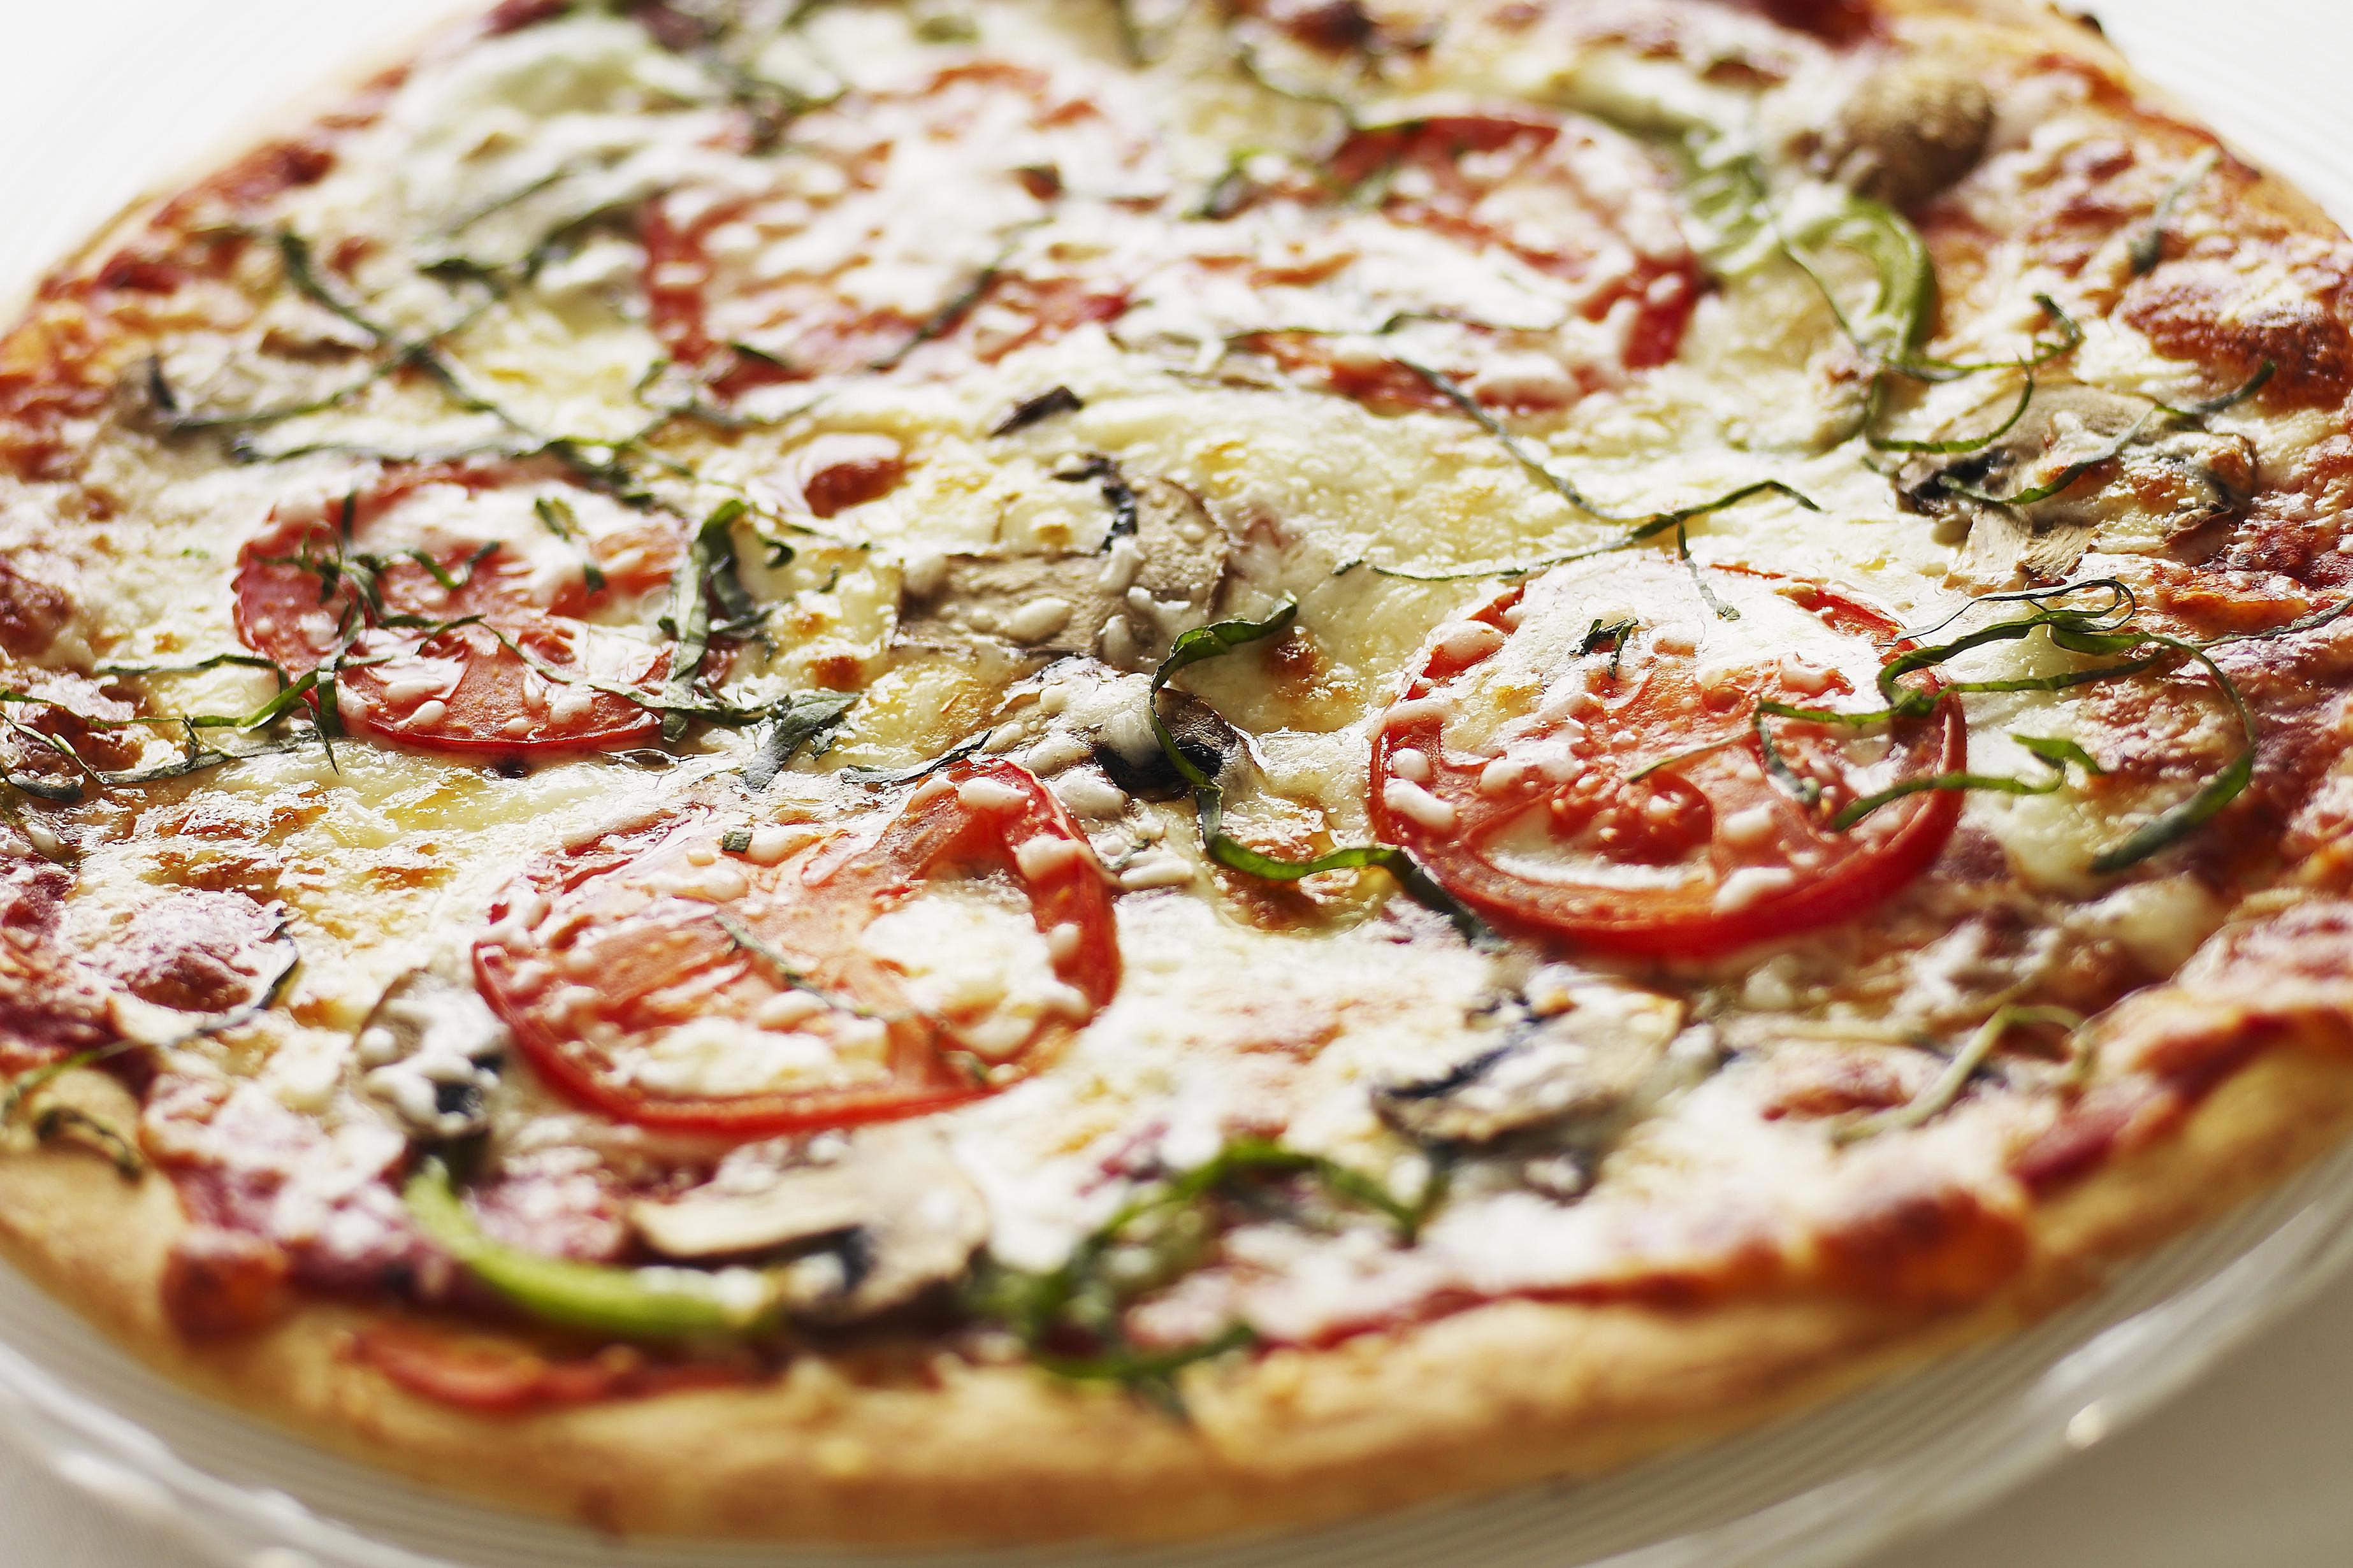 Wolfgang Puck's Pizza Dough Recipe